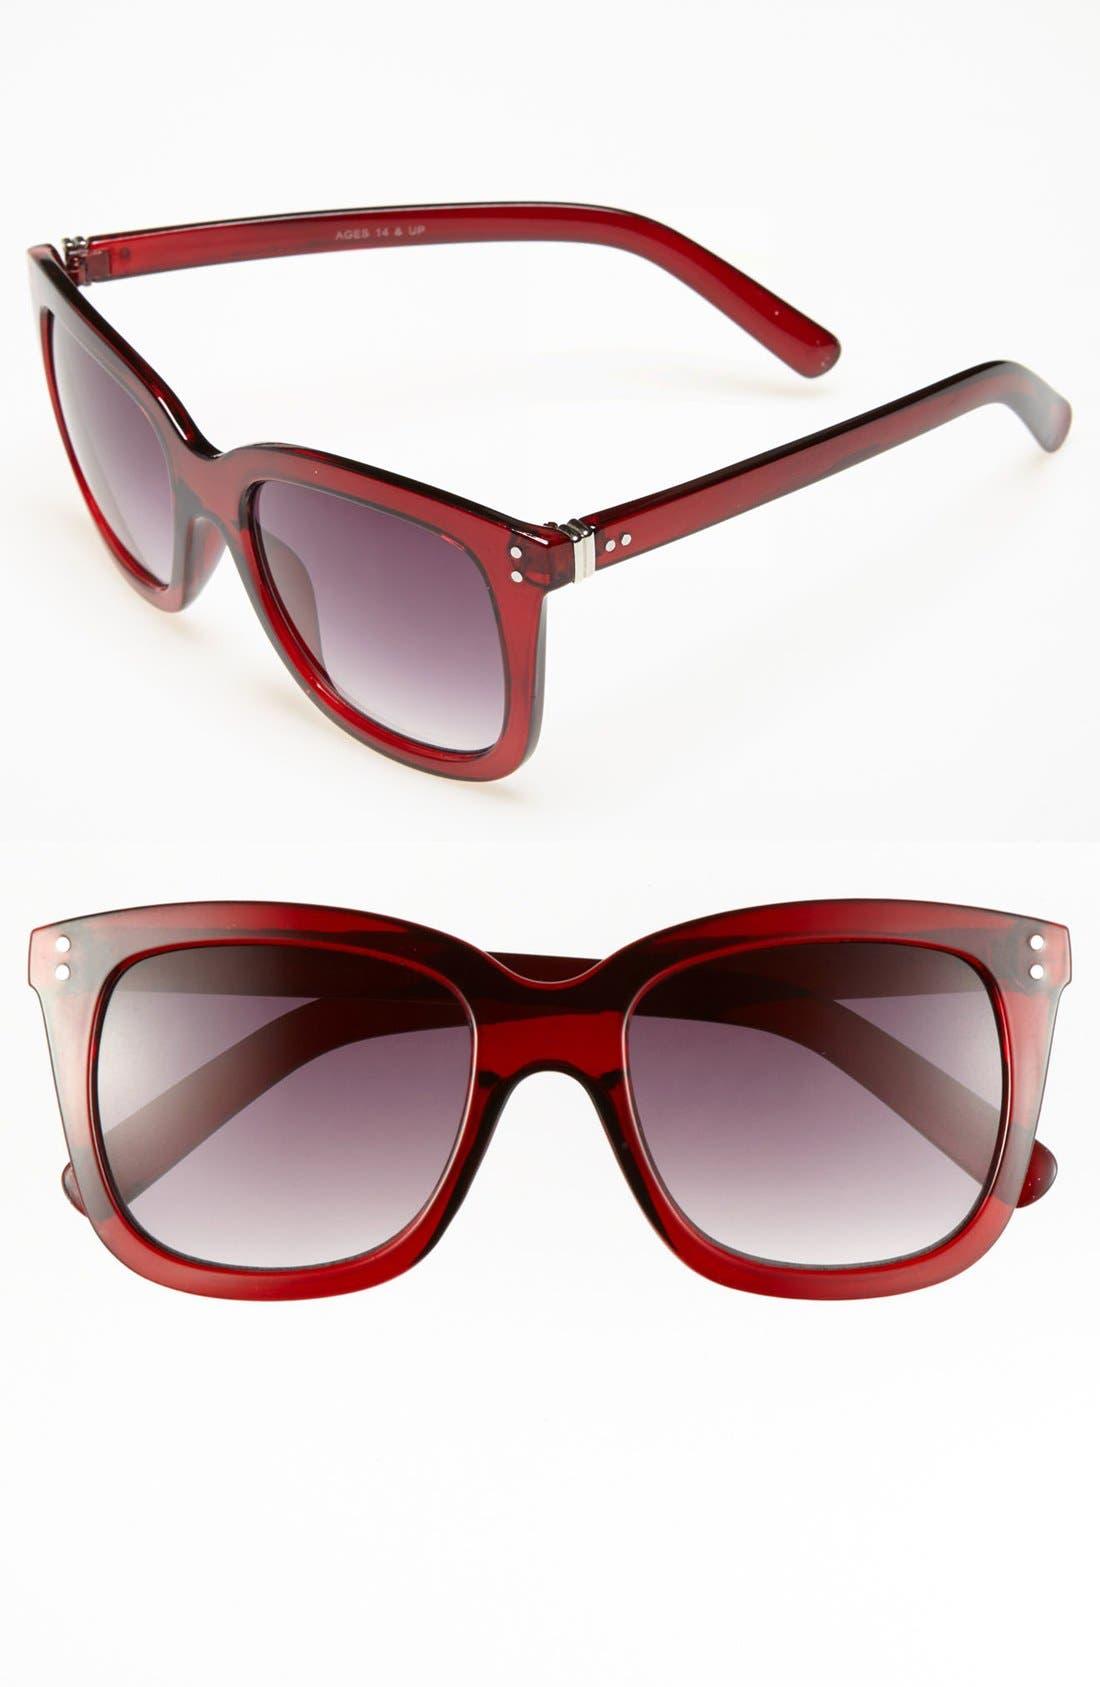 Alternate Image 1 Selected - FE NY 'Blue Blood' Sunglasses